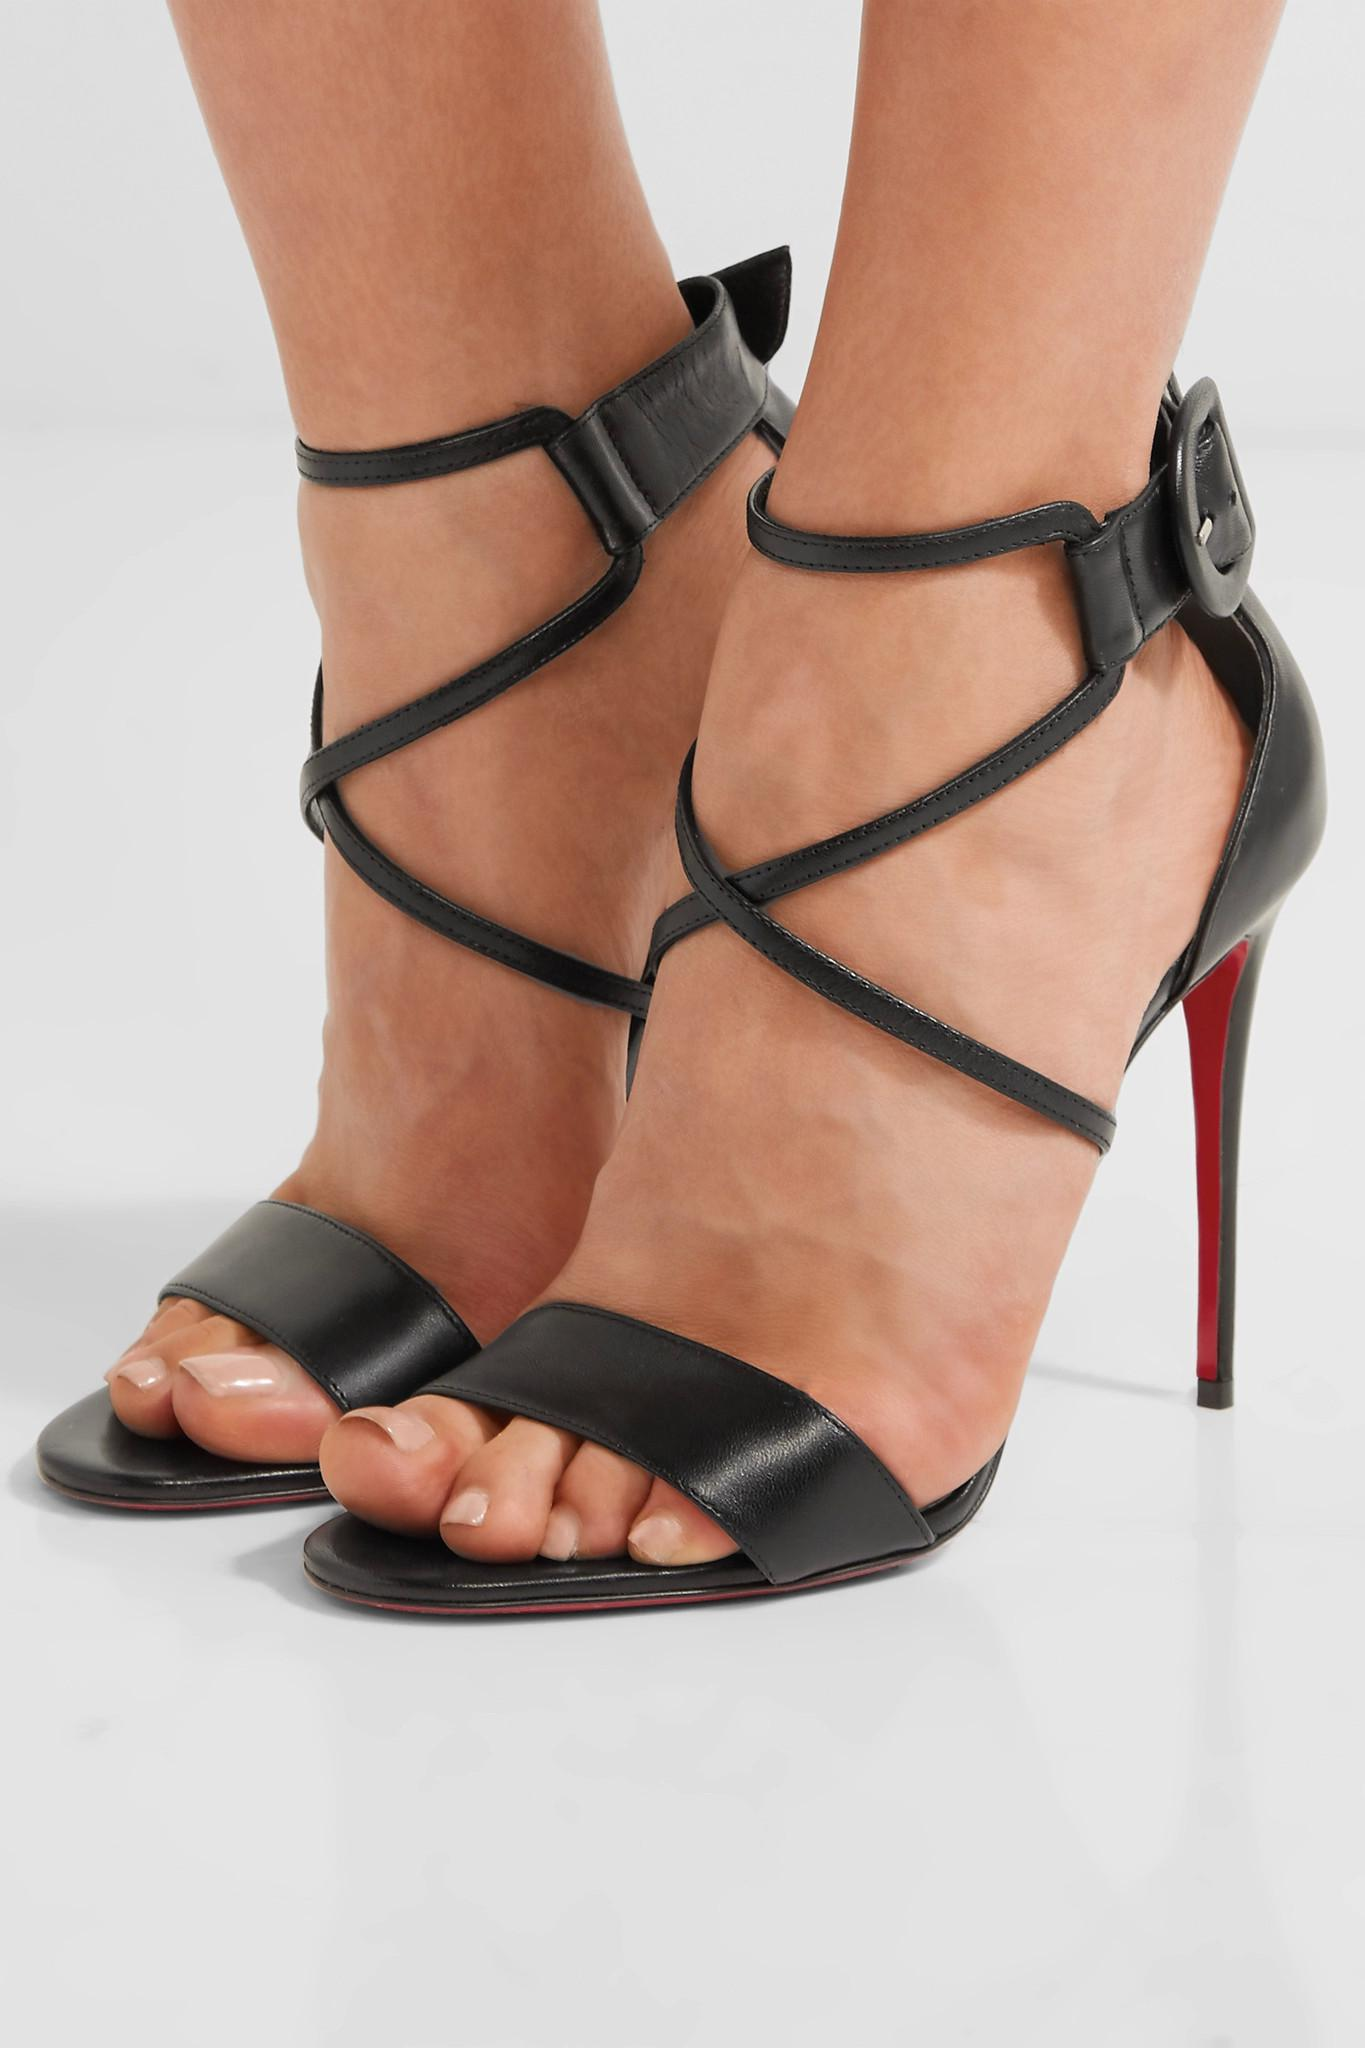 9b9f80ea167e Lyst - Christian Louboutin Choca 100 Leather Sandals in Black